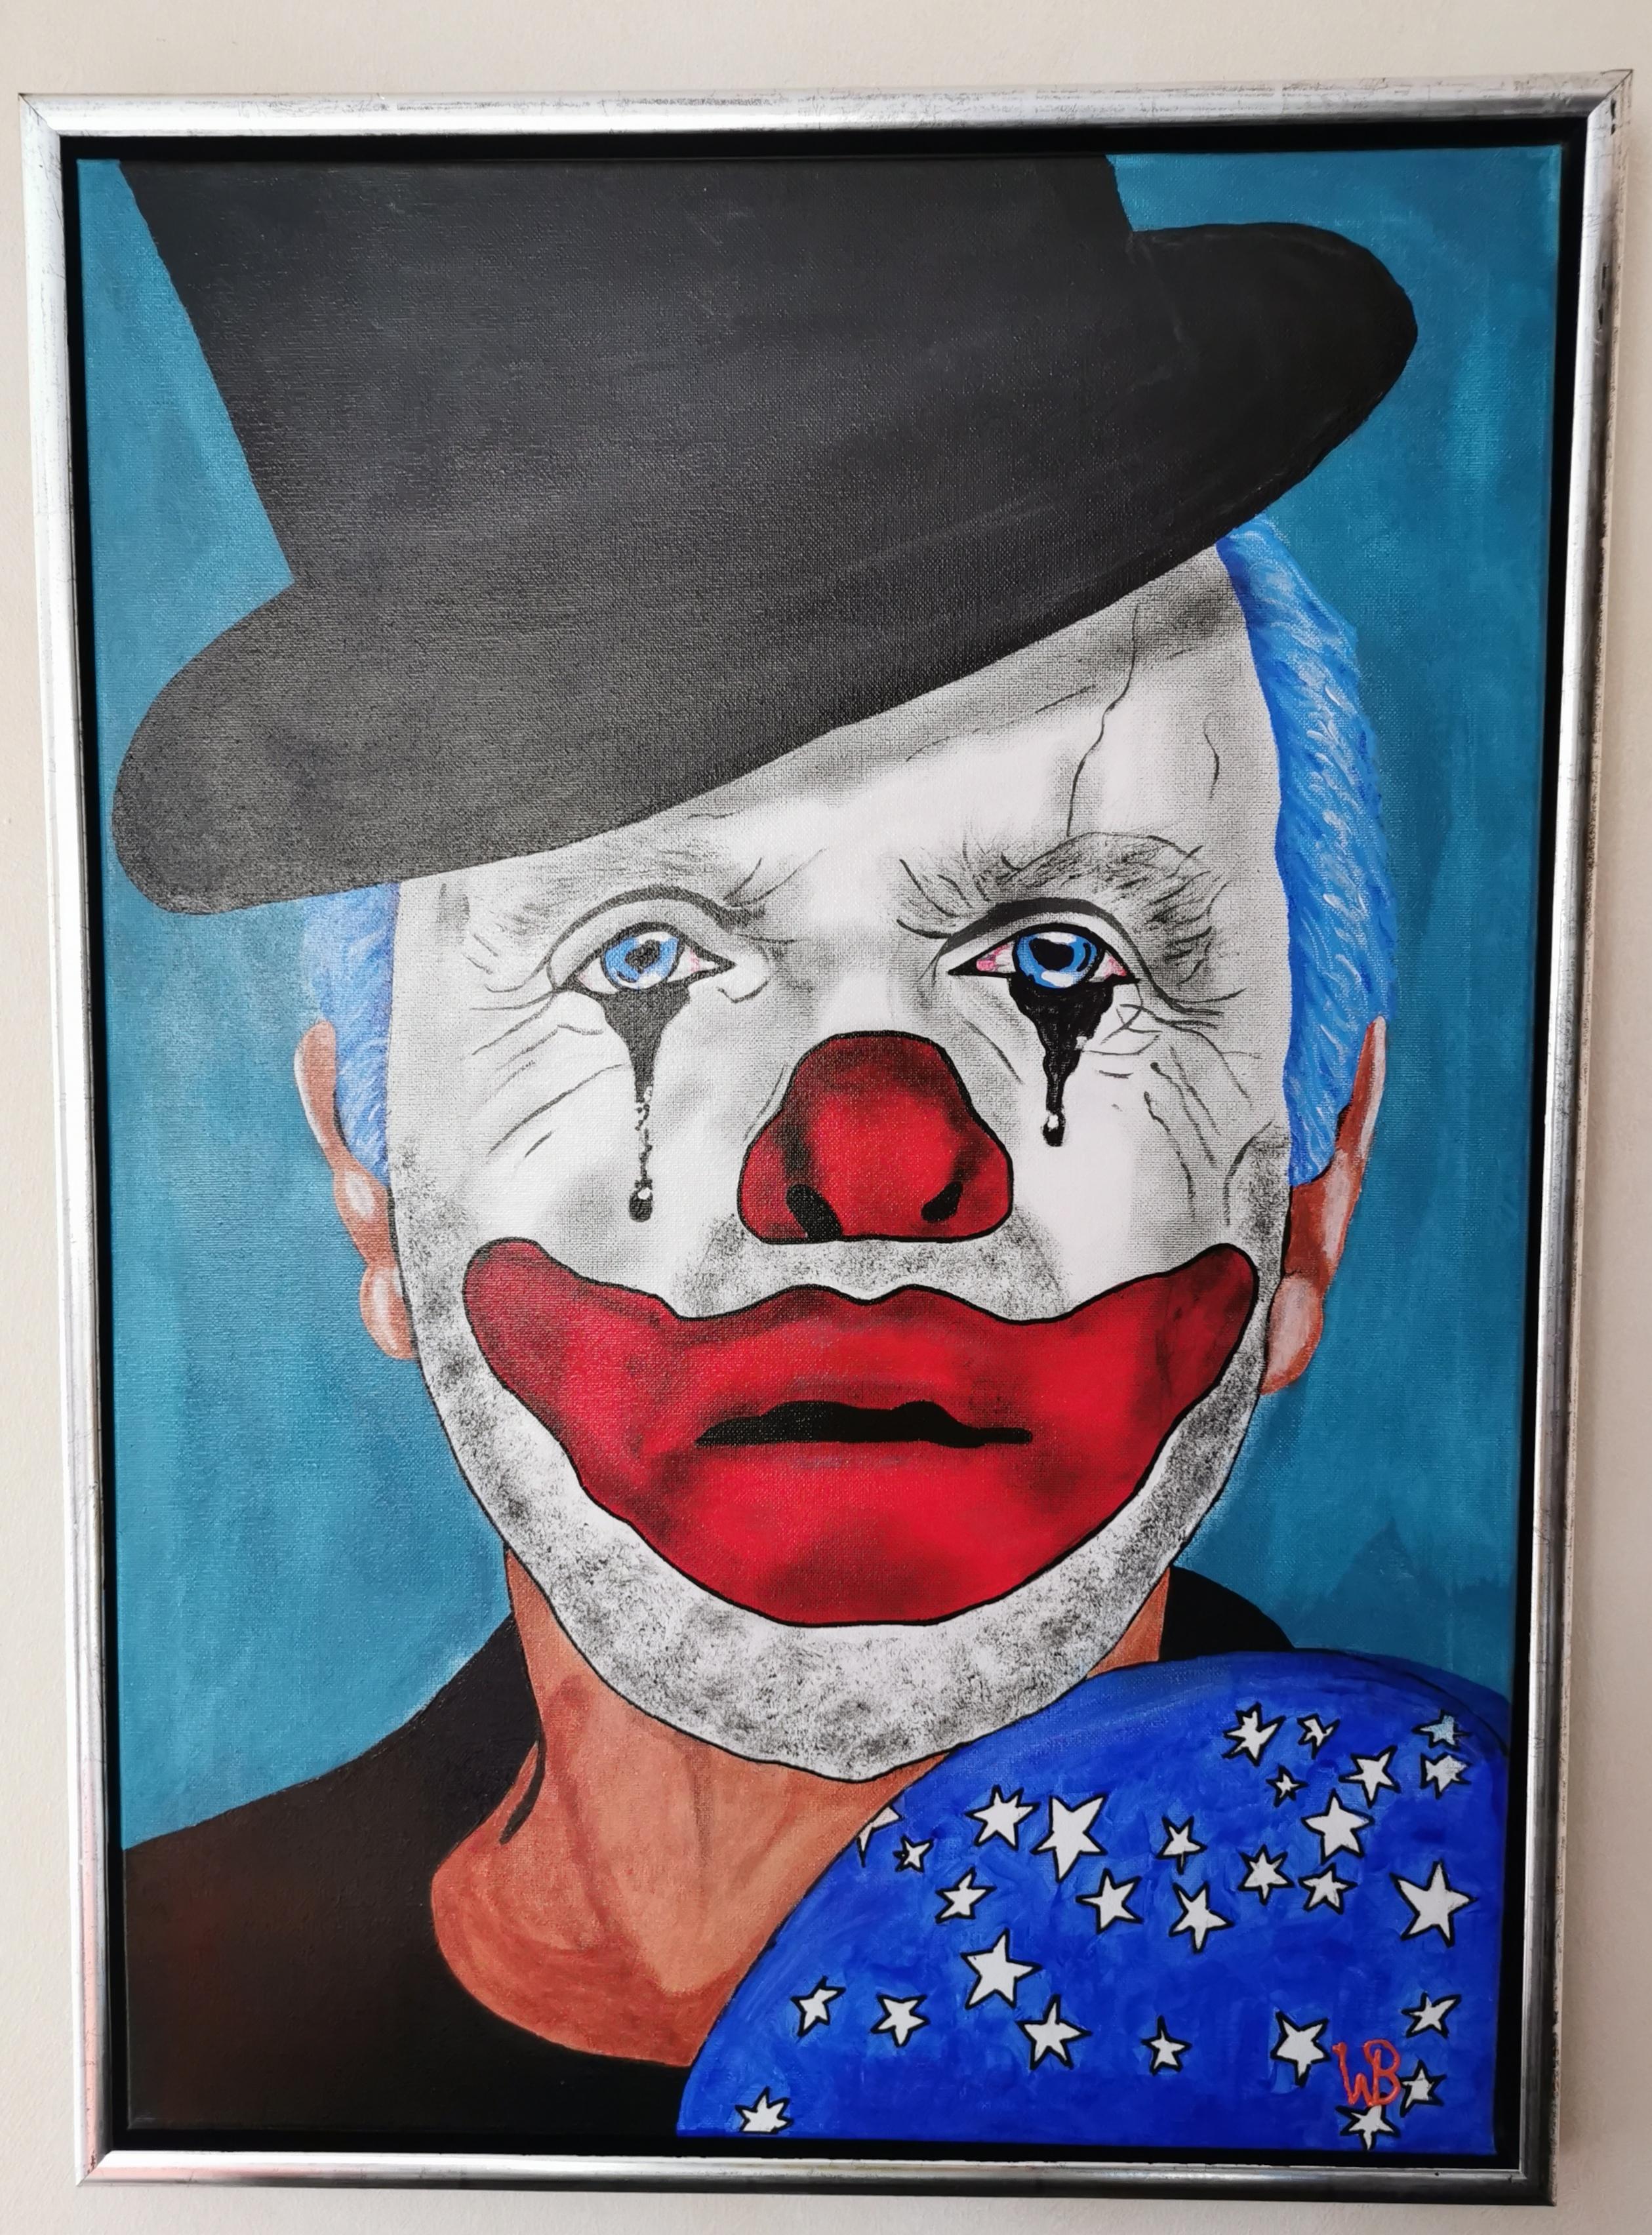 Trauriger Clown Wolfgang Broder Maler Kunstler